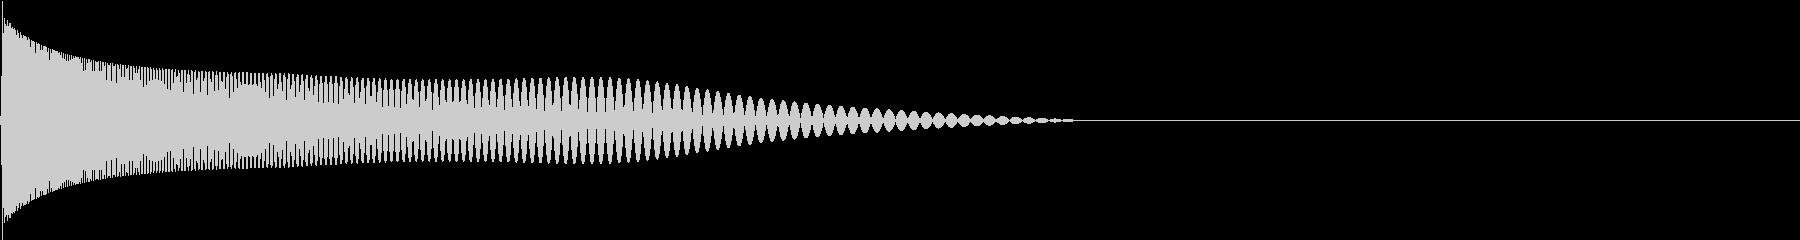 Retro ゲームのアタック音 3の未再生の波形